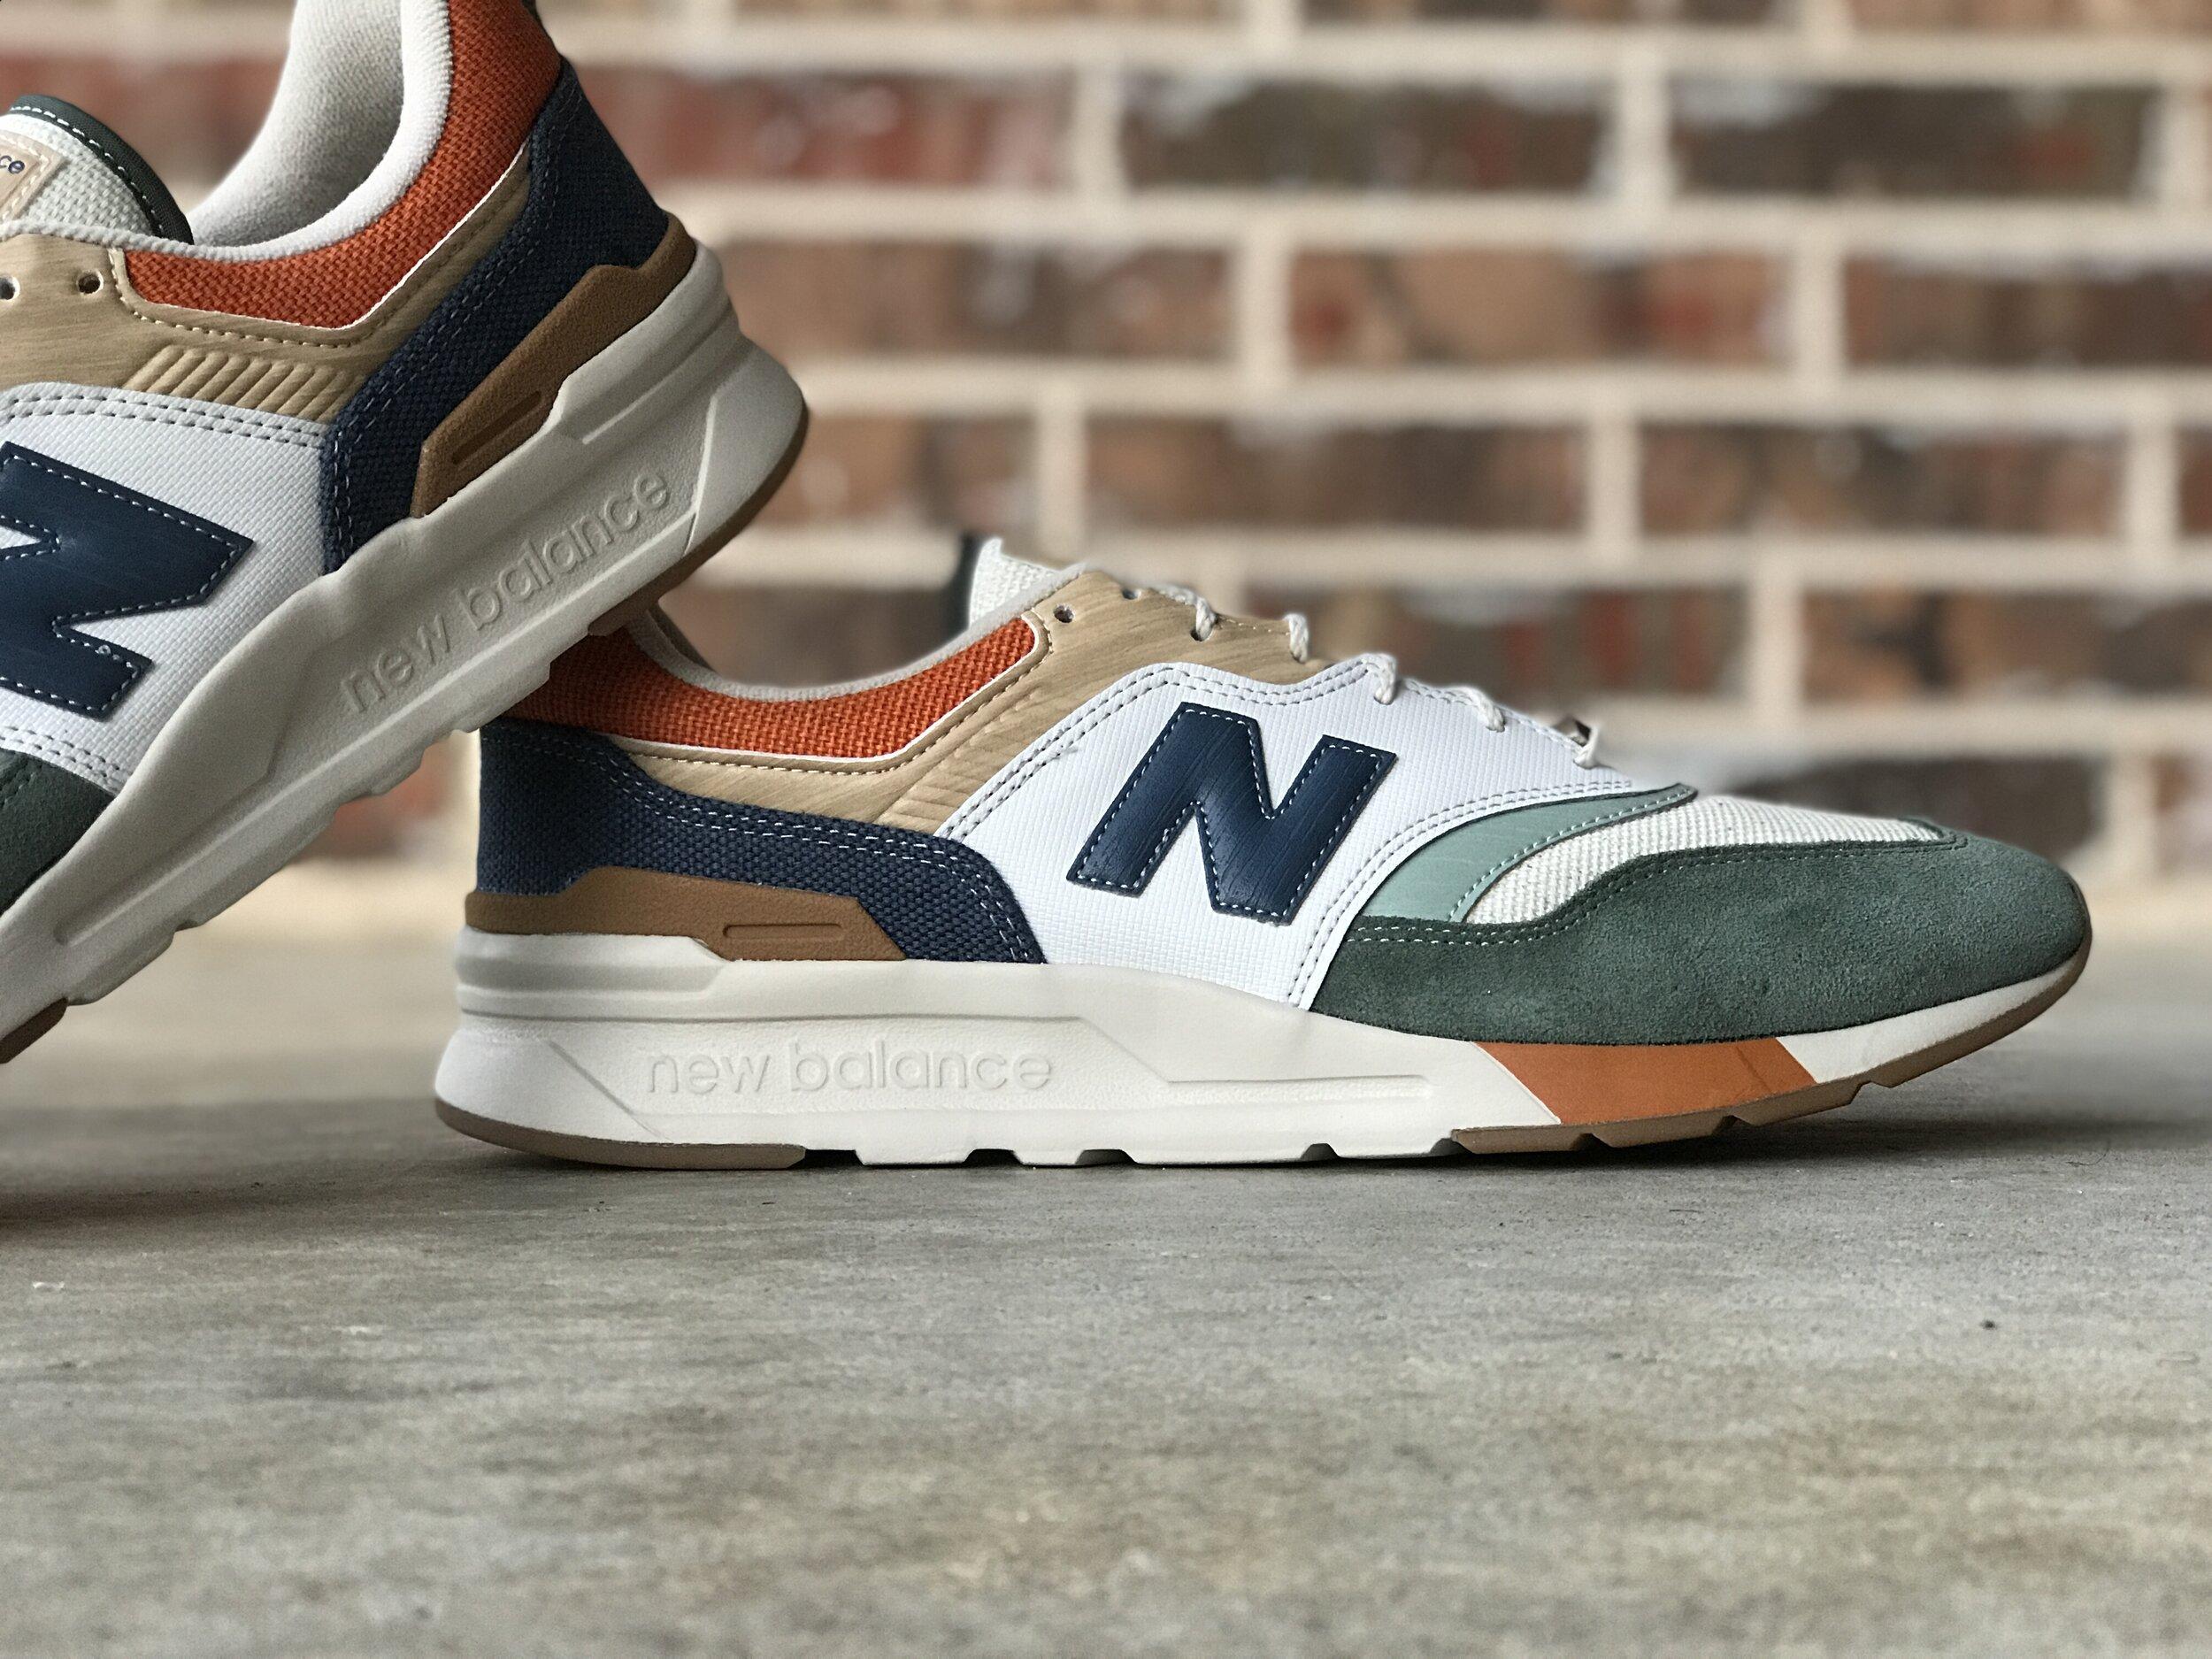 new balance 997h classic sneaker